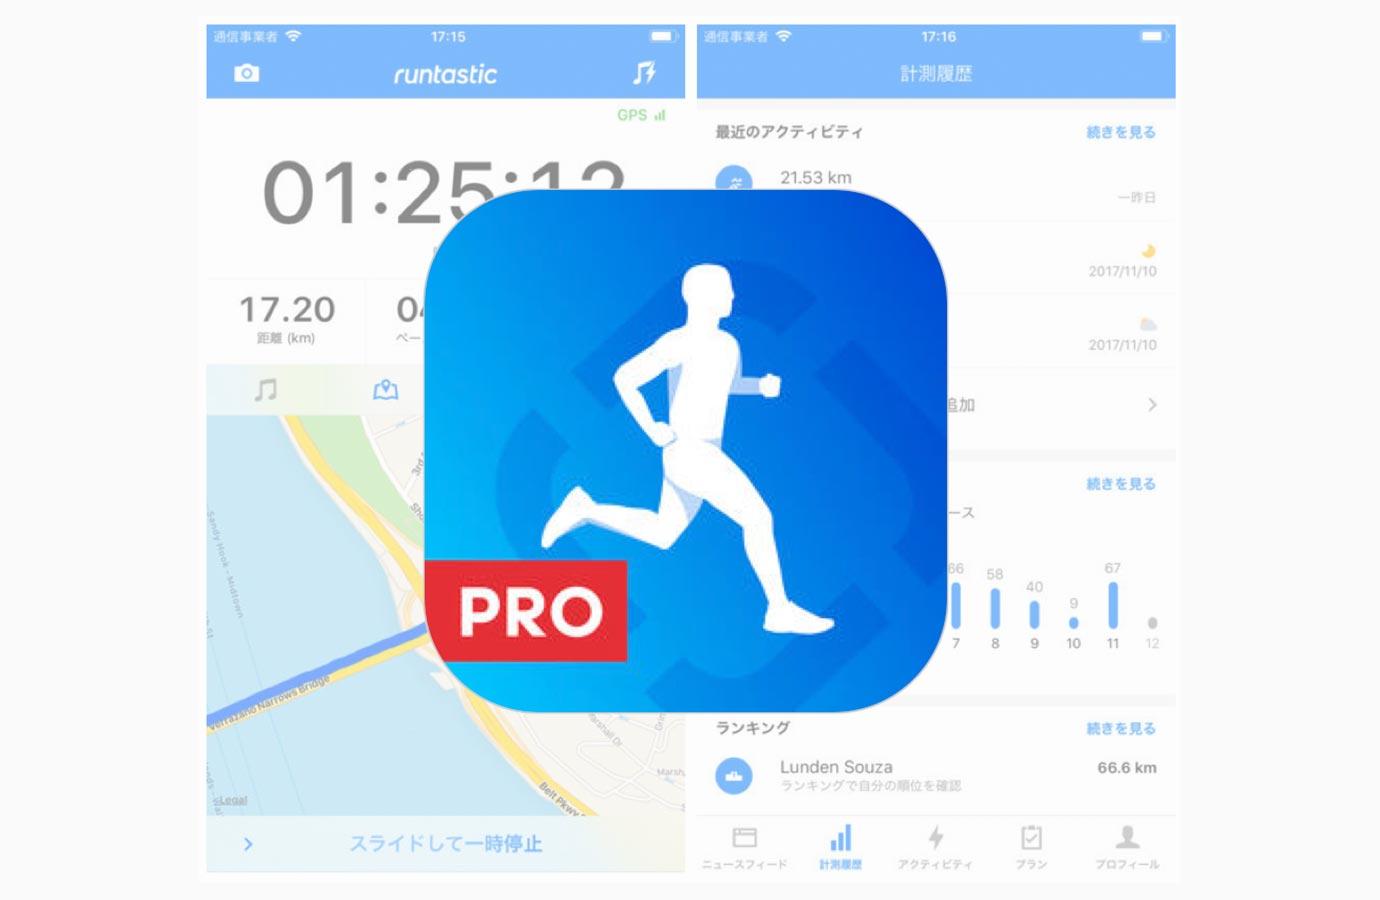 iOSアプリ「Runtastic PRO ランニング&ウォーキング」がアップデートで全面的にリニューアル、iPhone Xの画面にも対応